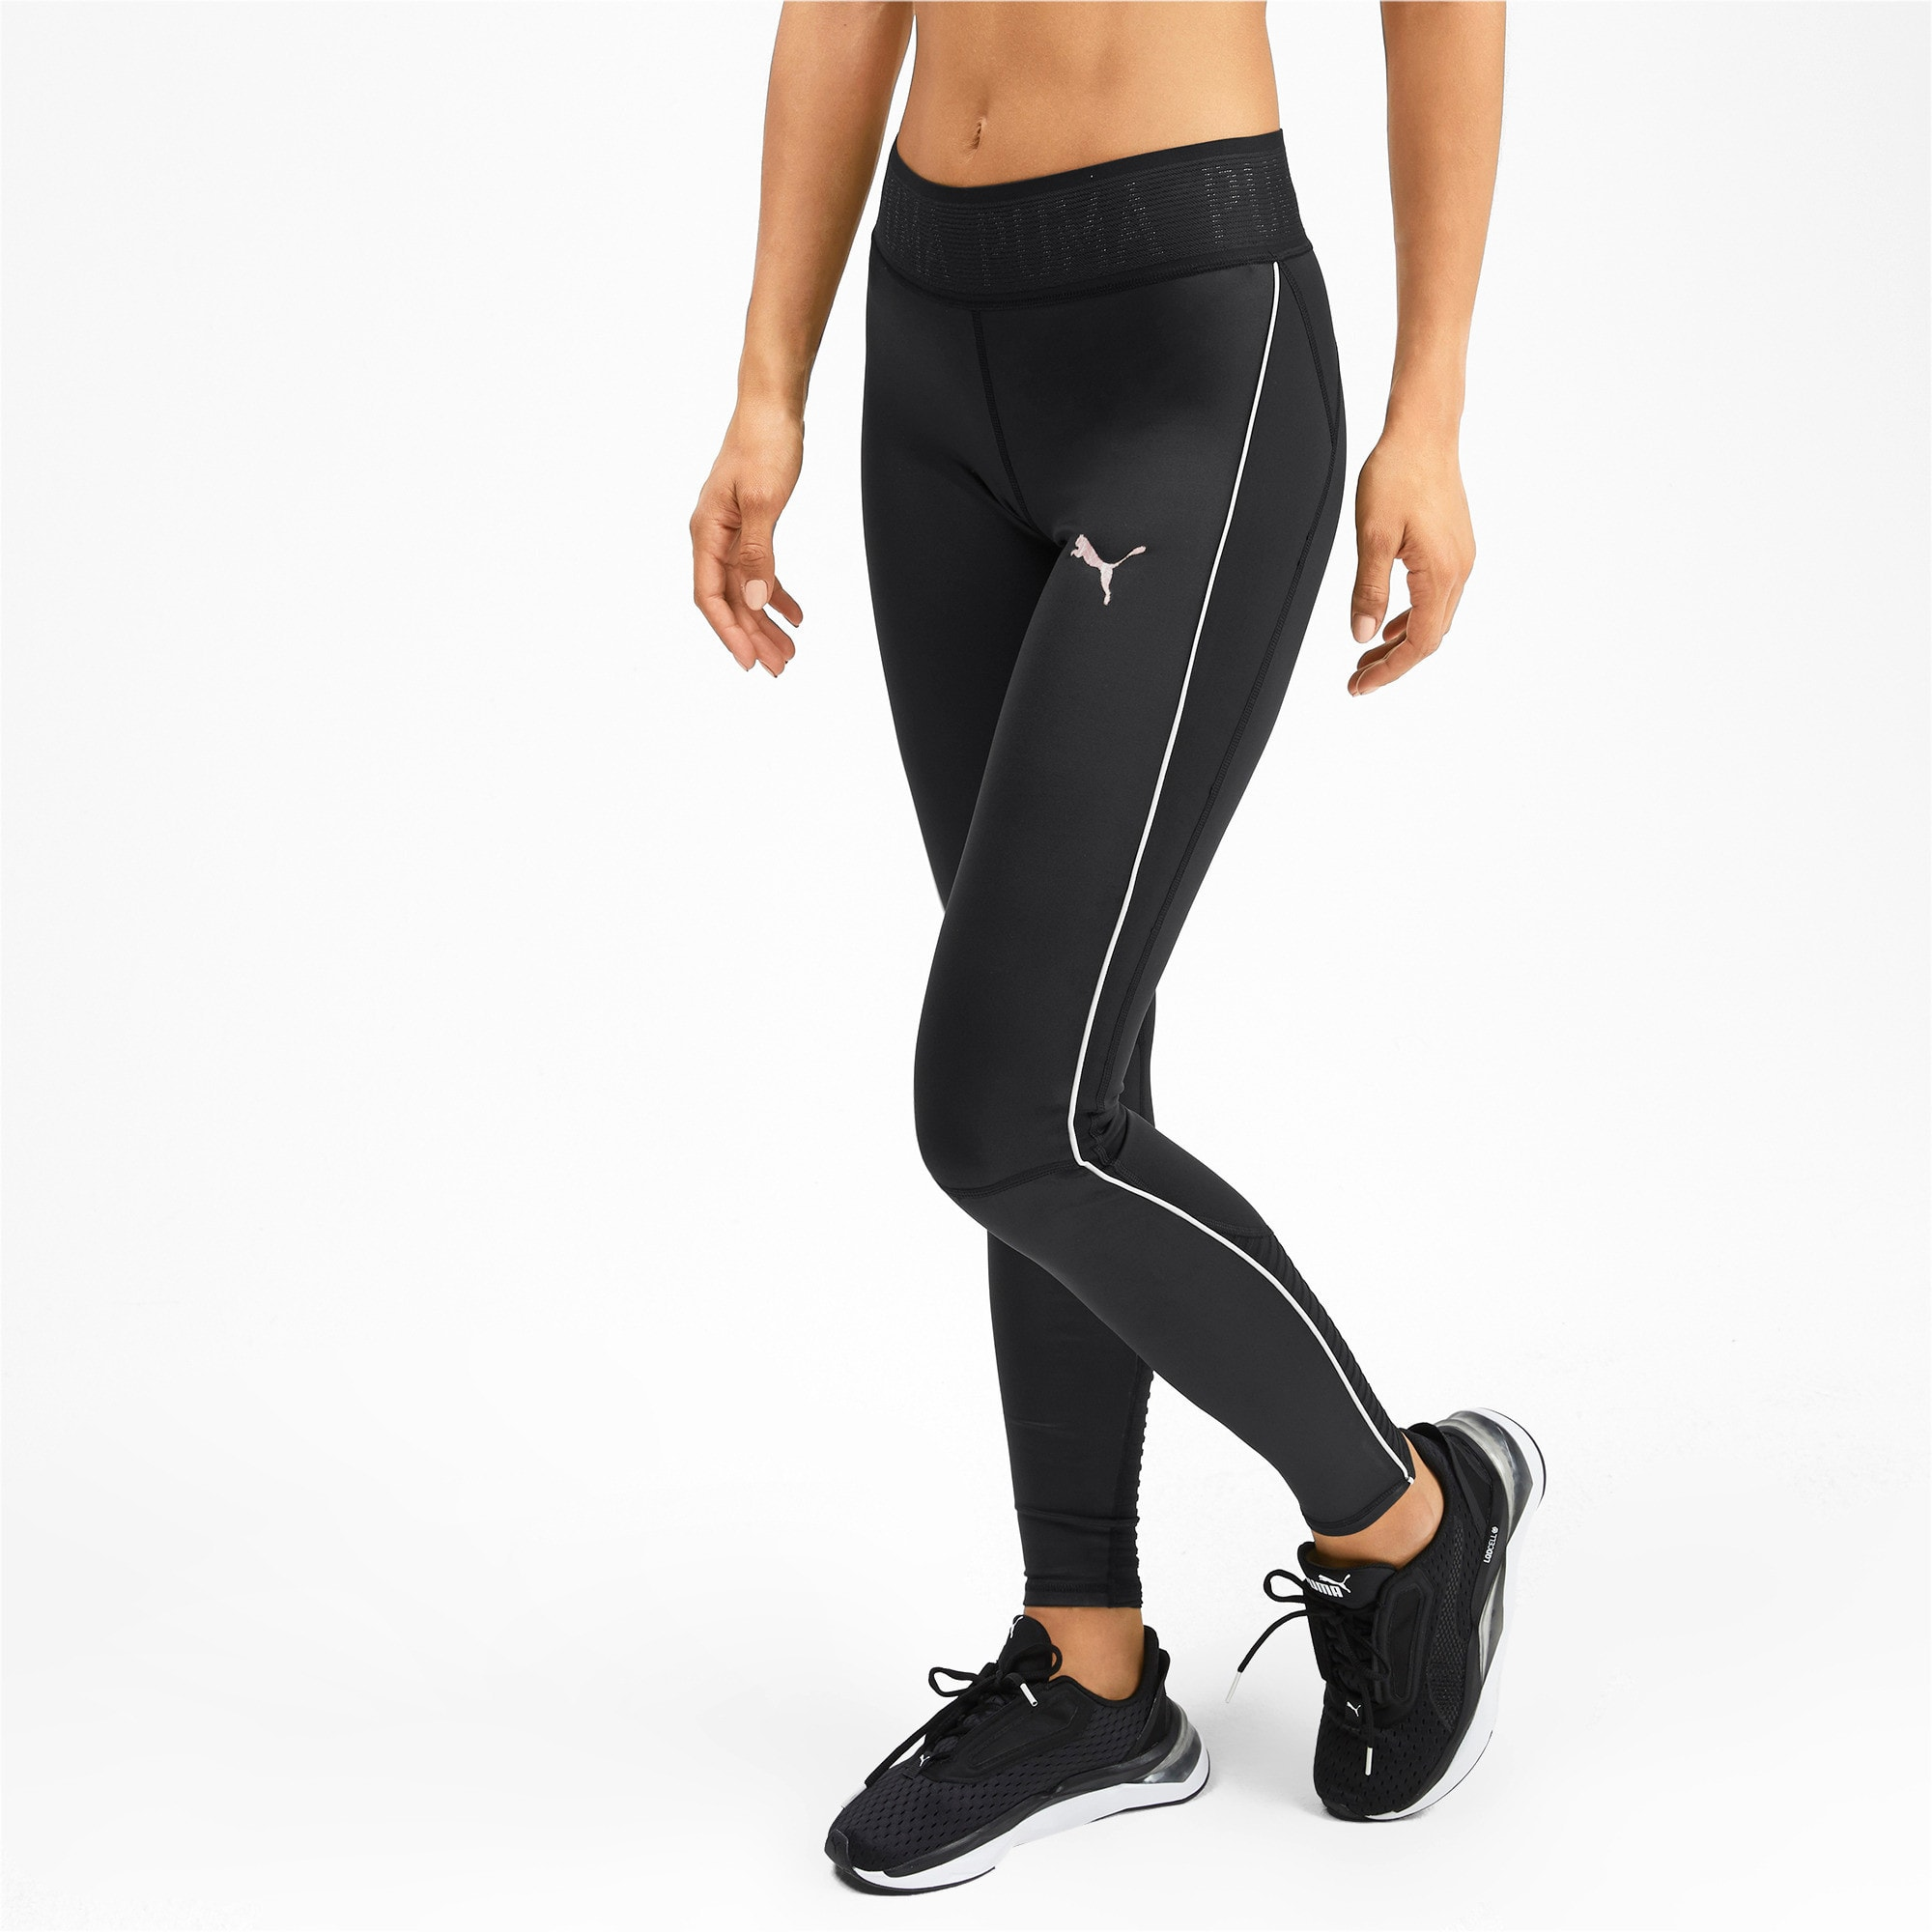 Thumbnail 1 of SHIFT Women's Training Leggings, Puma Black, medium-IND